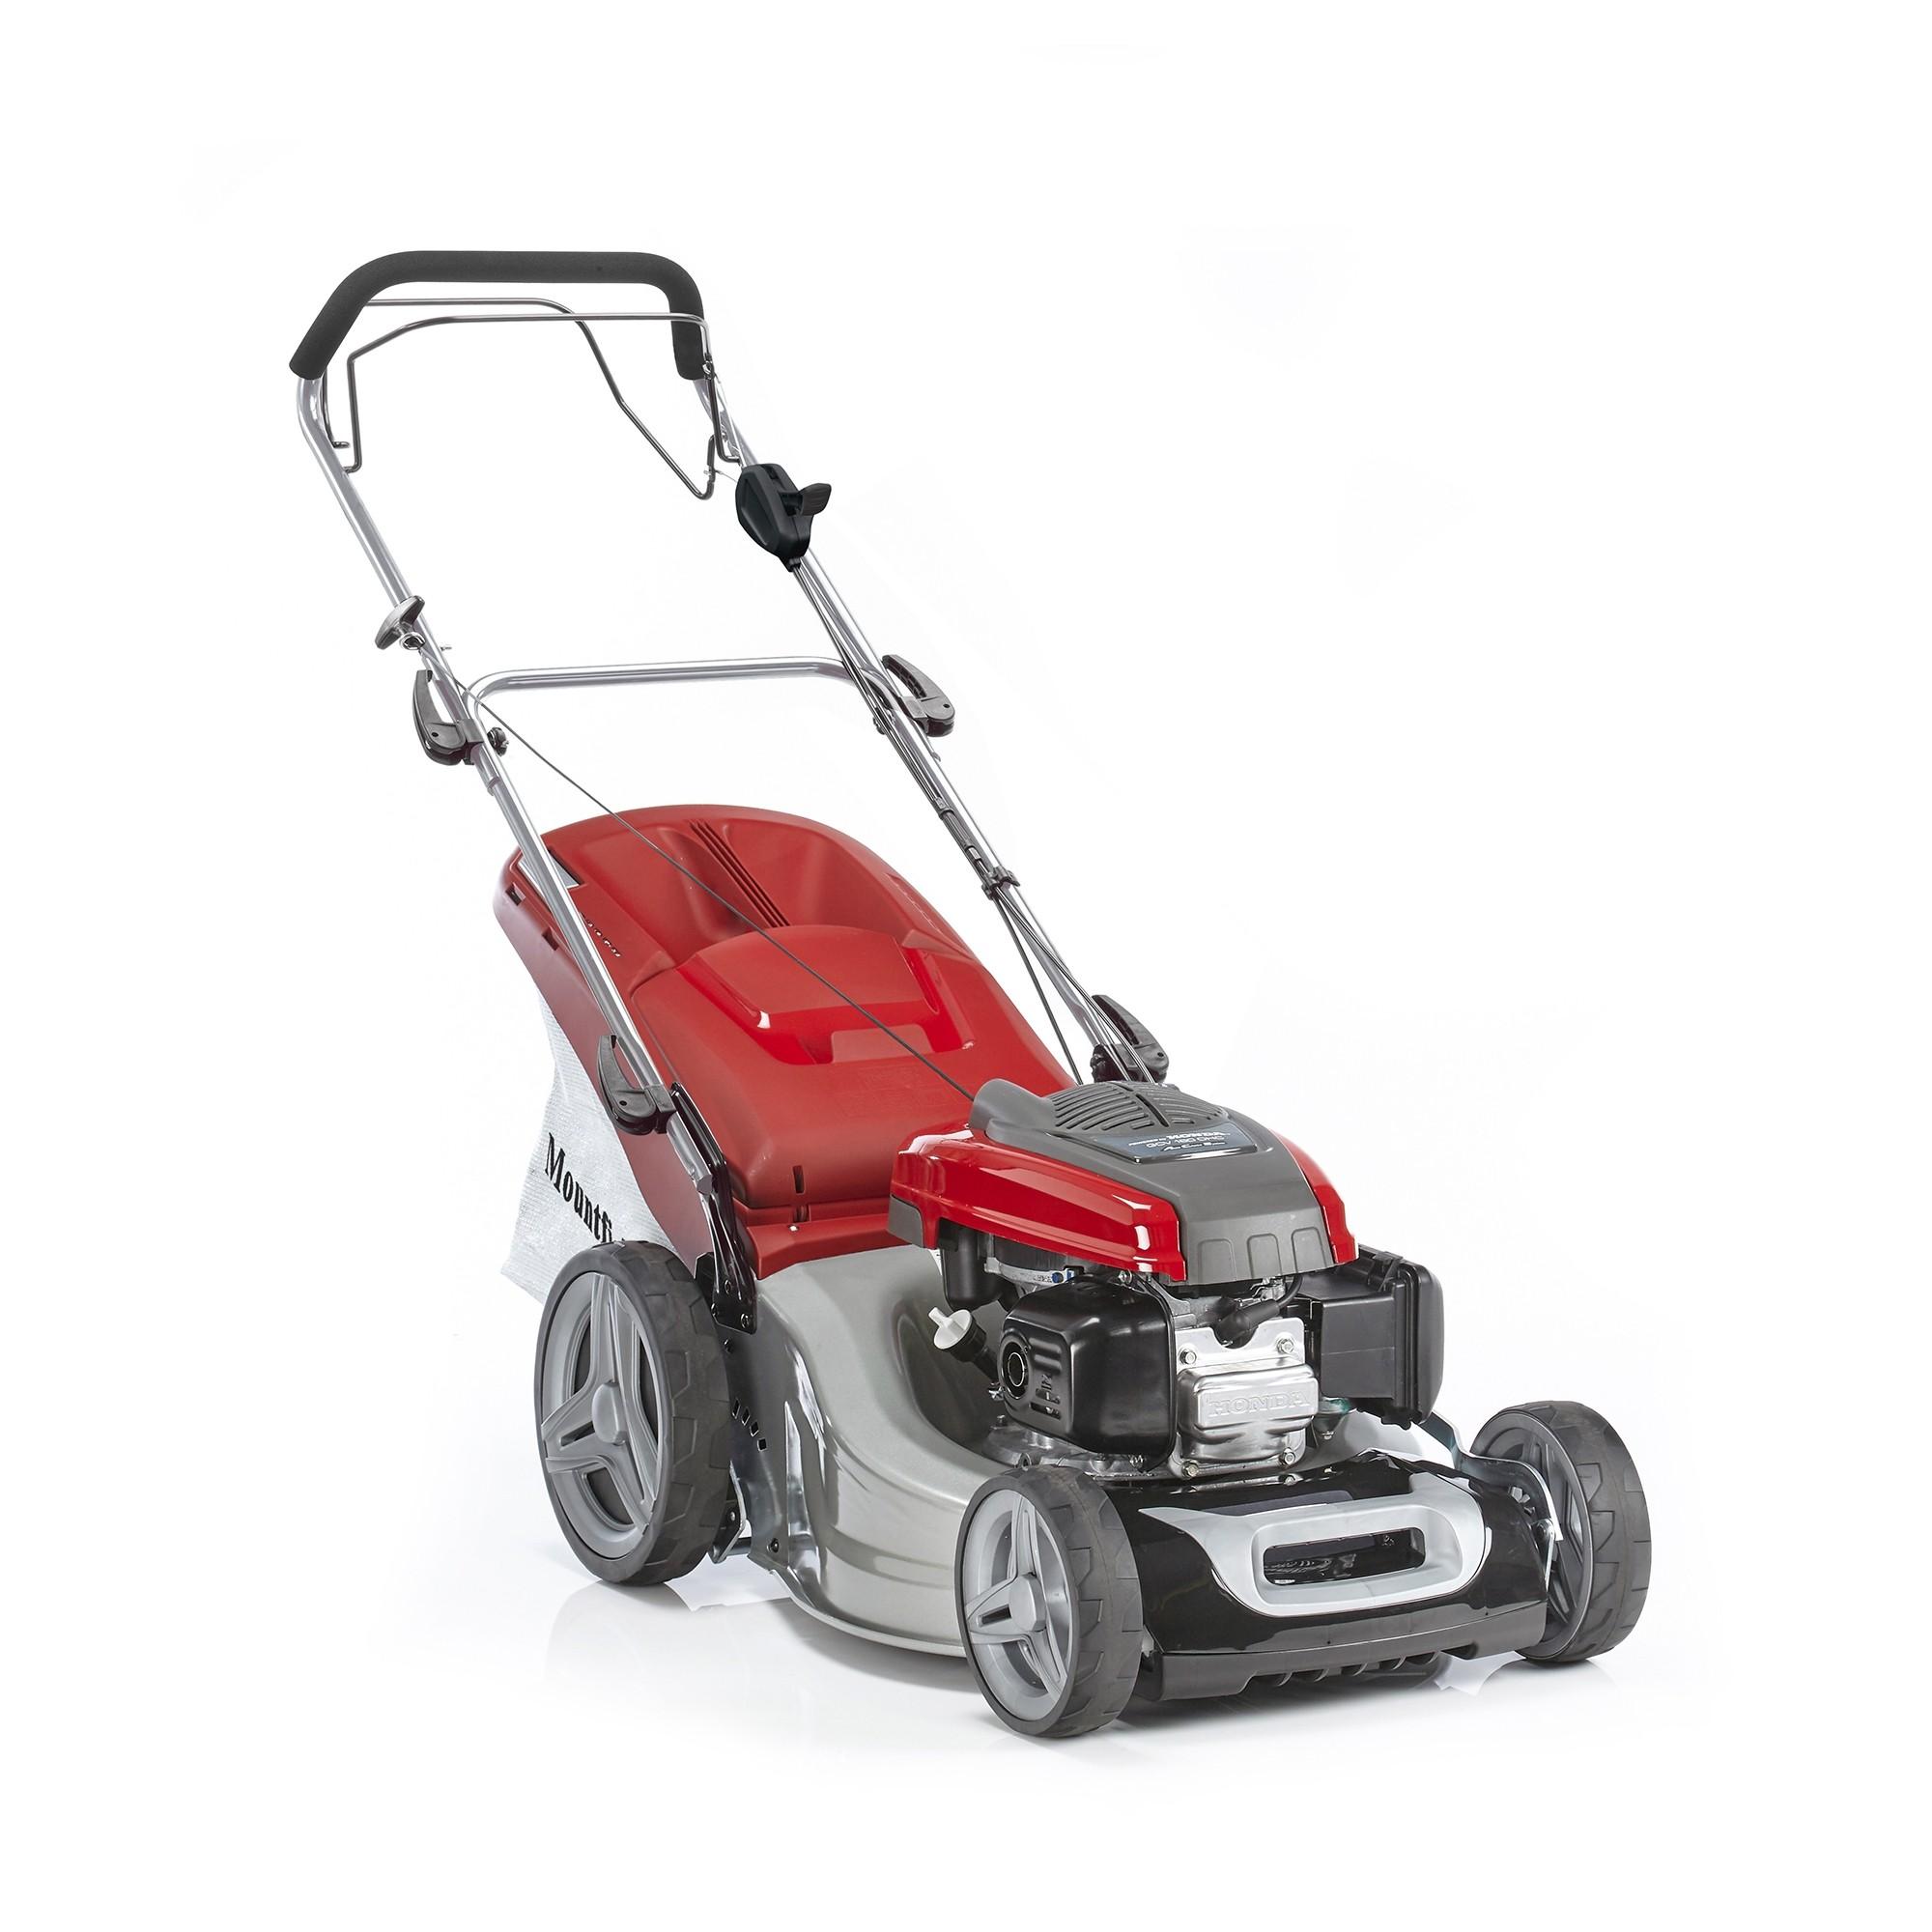 Mountfield SP485HW-V 48cm petrol lawn mower